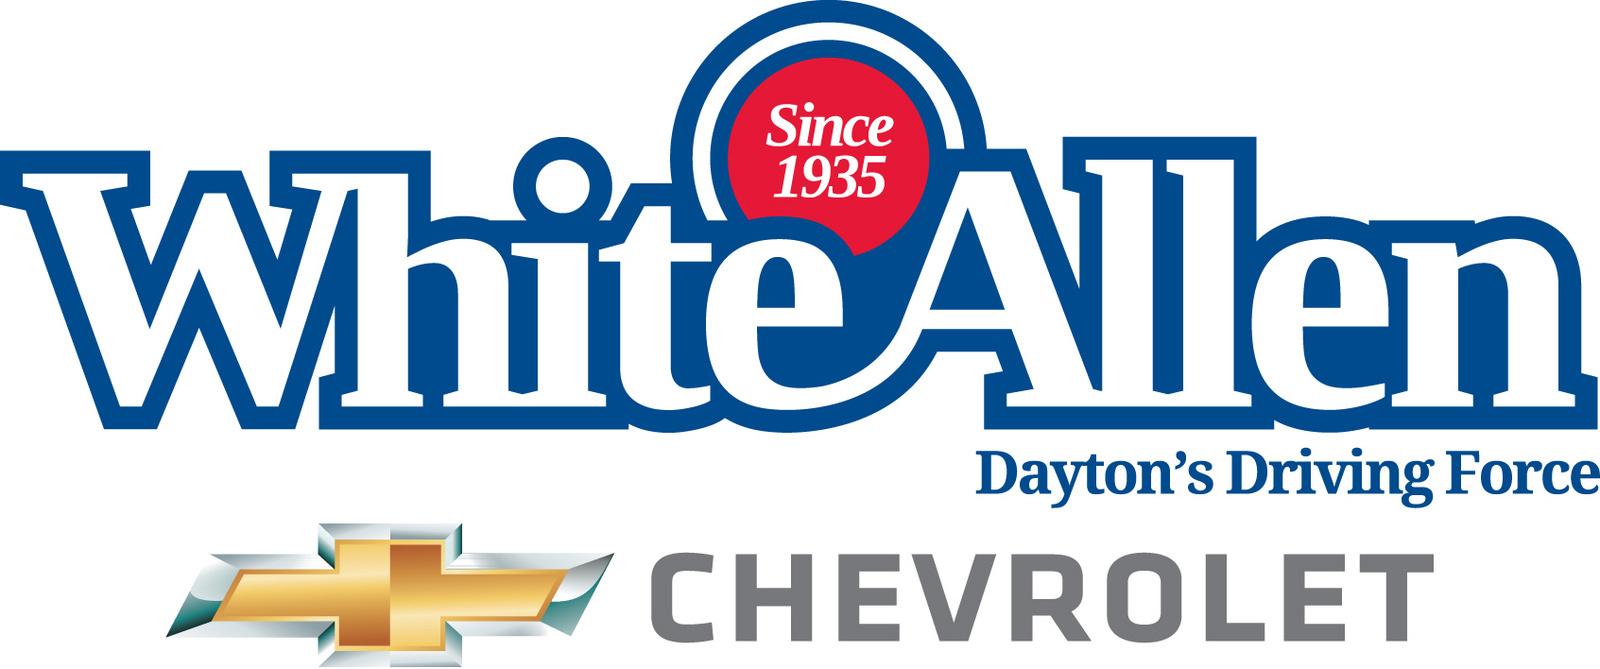 Jeep Dealers Dayton Ohio >> White Allen Chevrolet - Dayton, OH: Read Consumer reviews ...